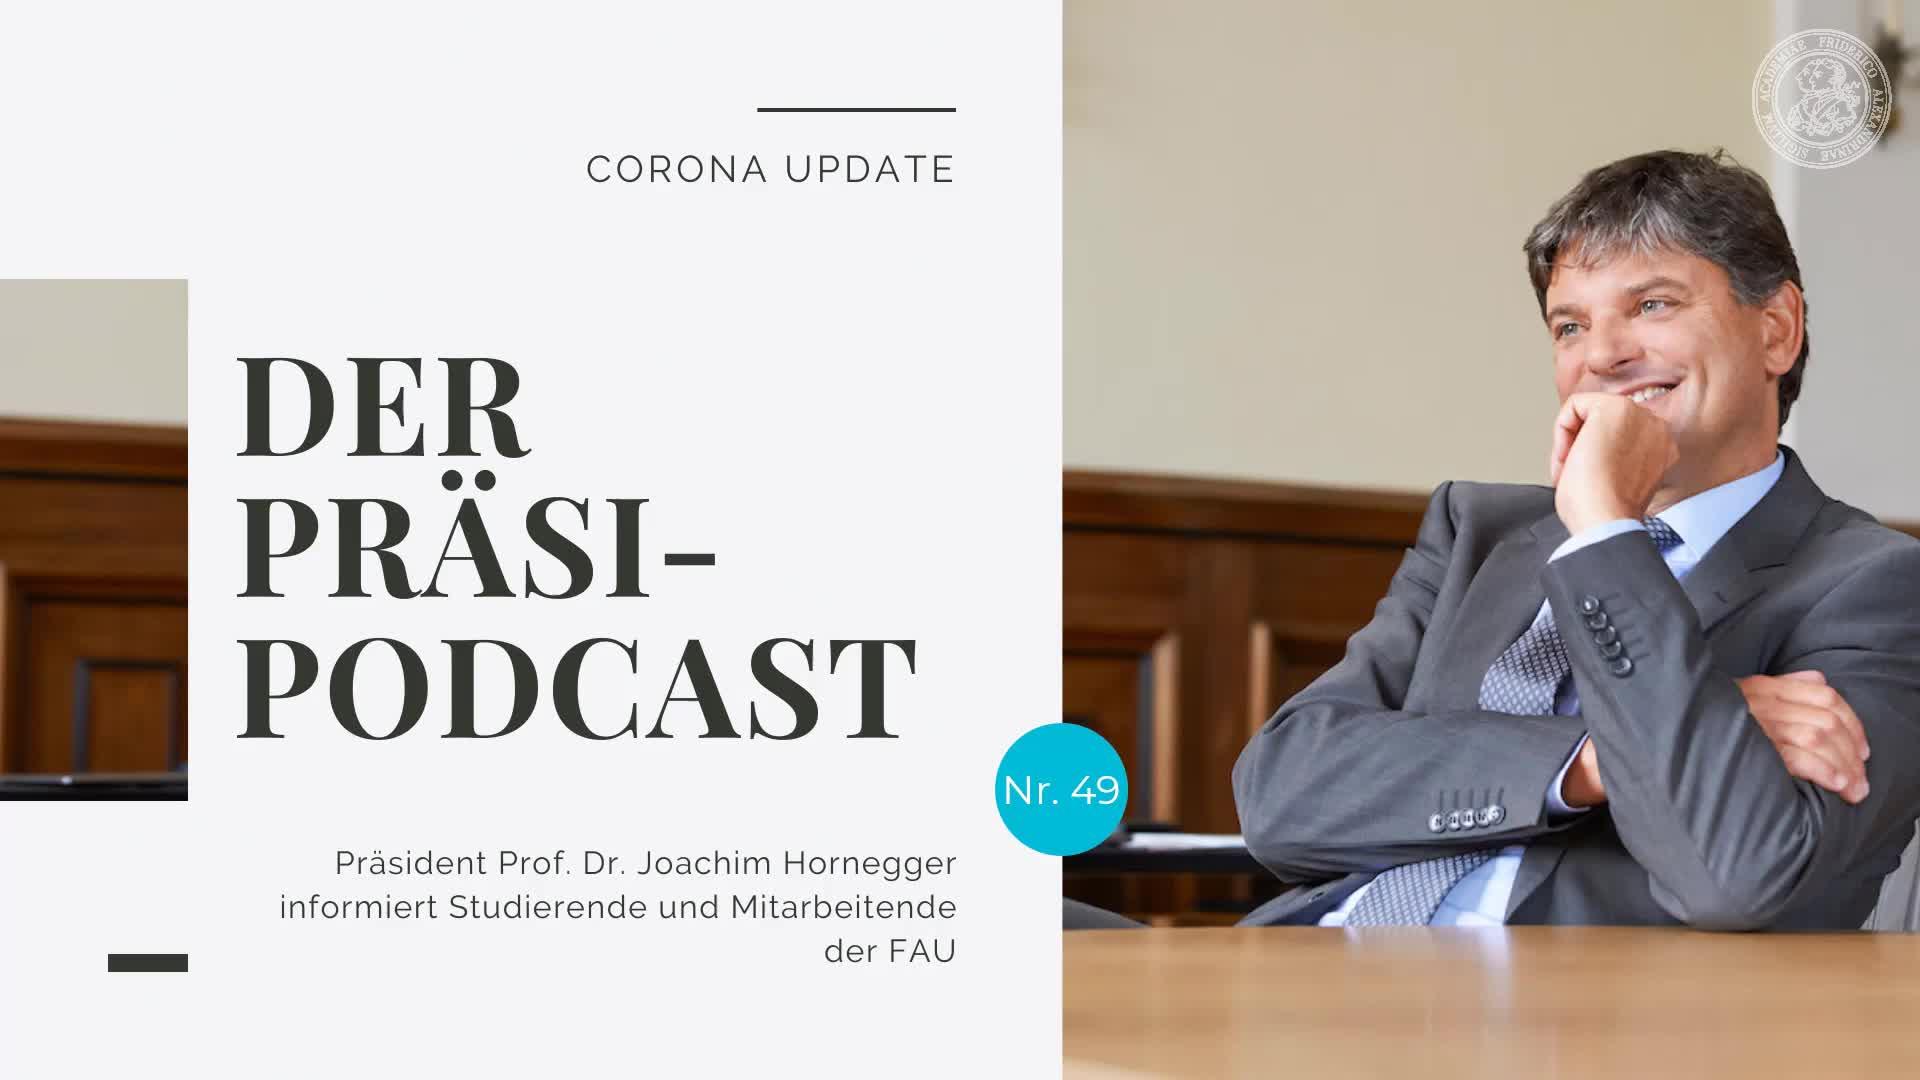 """Der Präsi-Podcast"" vom 30.7.2021 preview image"